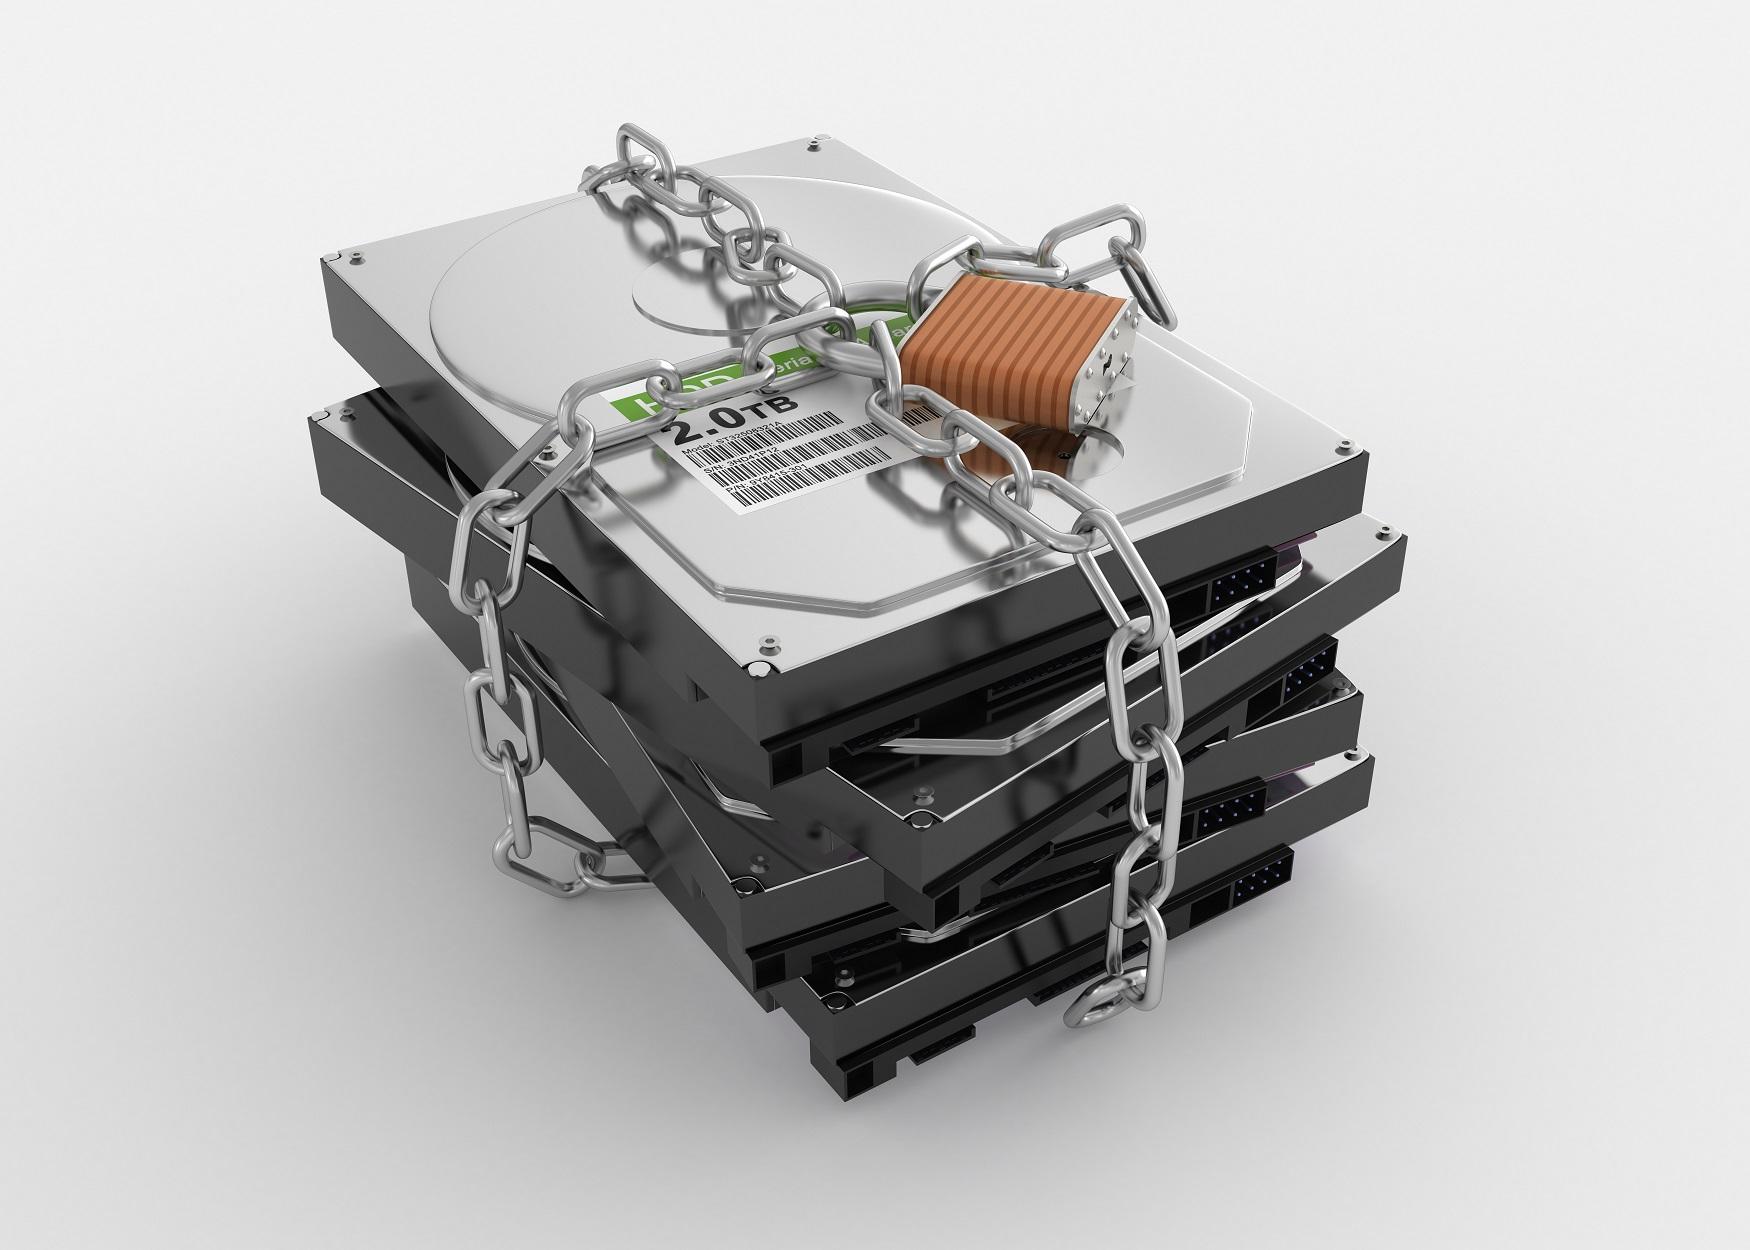 harddisk and padlock